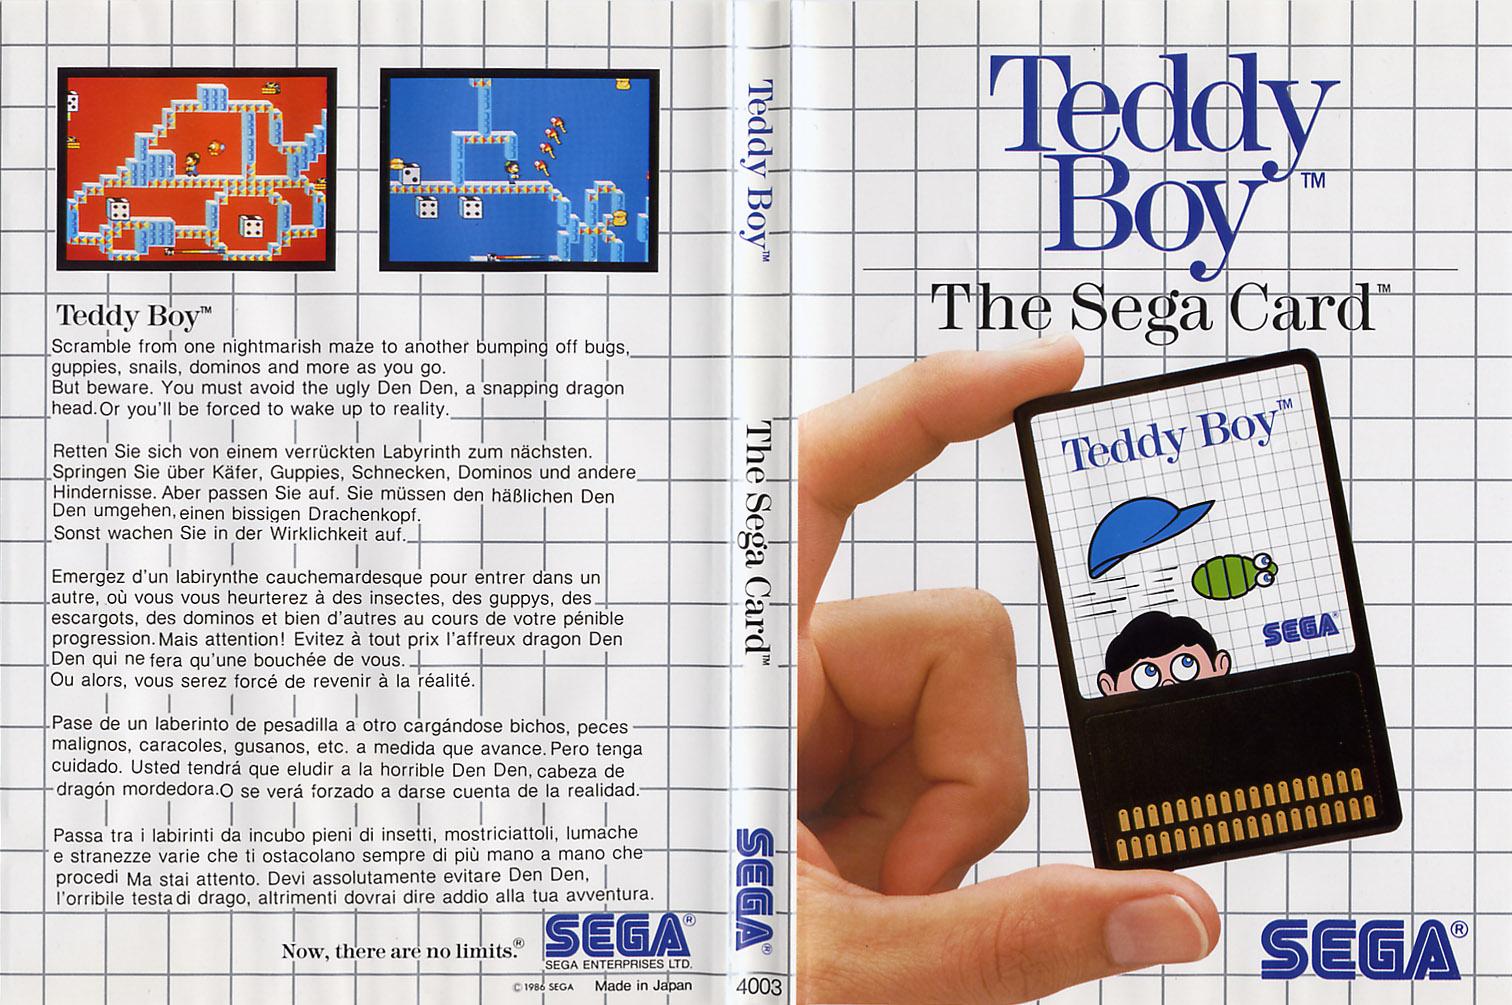 [Master System] Les Sega Card Pal TeddyBoy-SMS-EU-Card-NoLimitsR